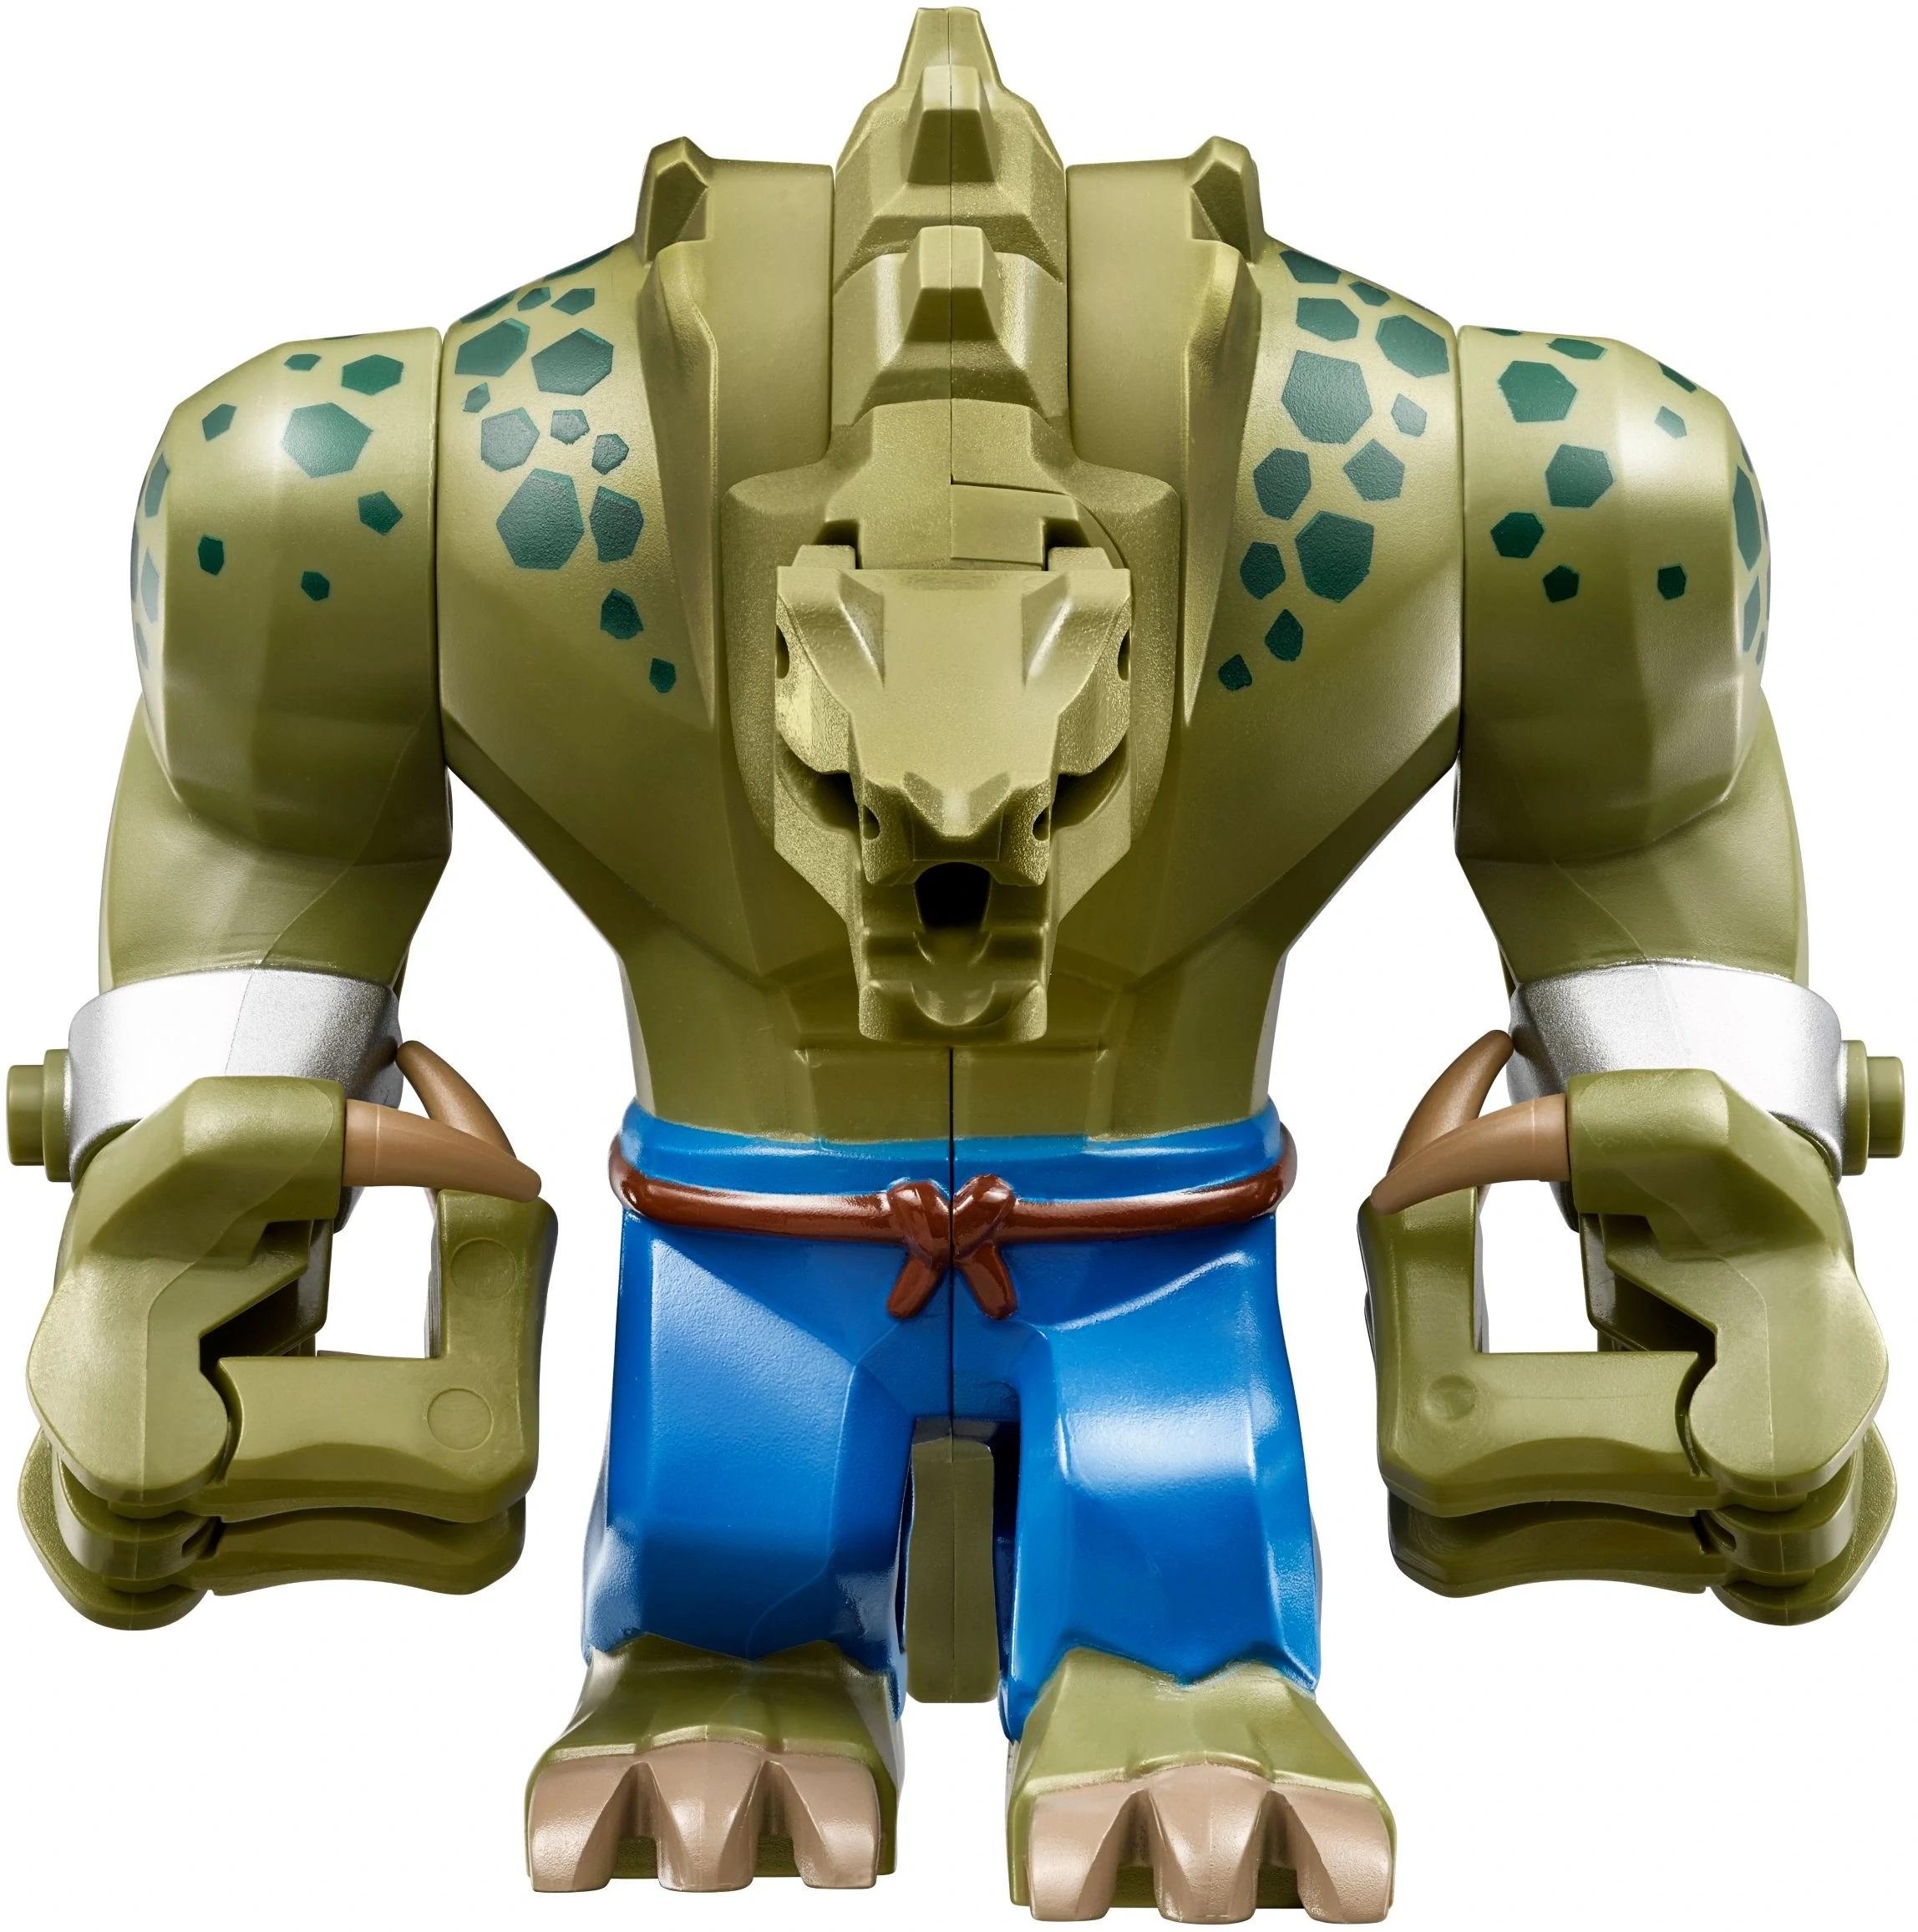 Killer Croc Brickipedia Fandom Powered By Wikia